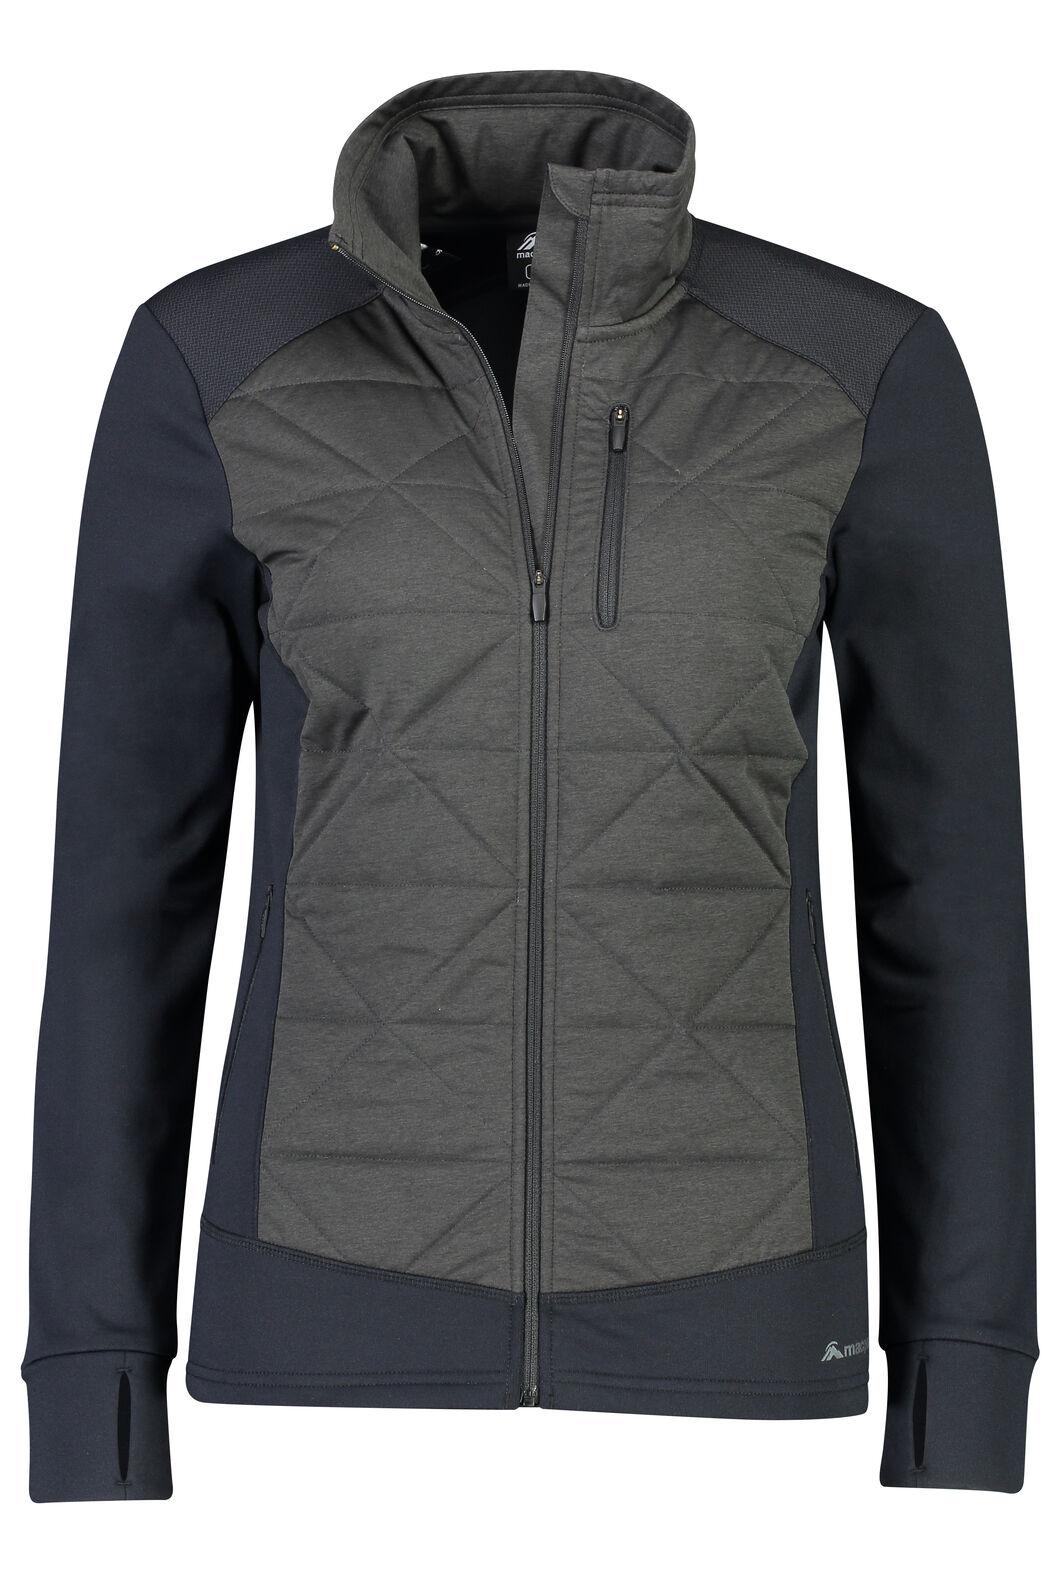 Accelerate PrimaLoft® Jacket - Women's, Black, hi-res